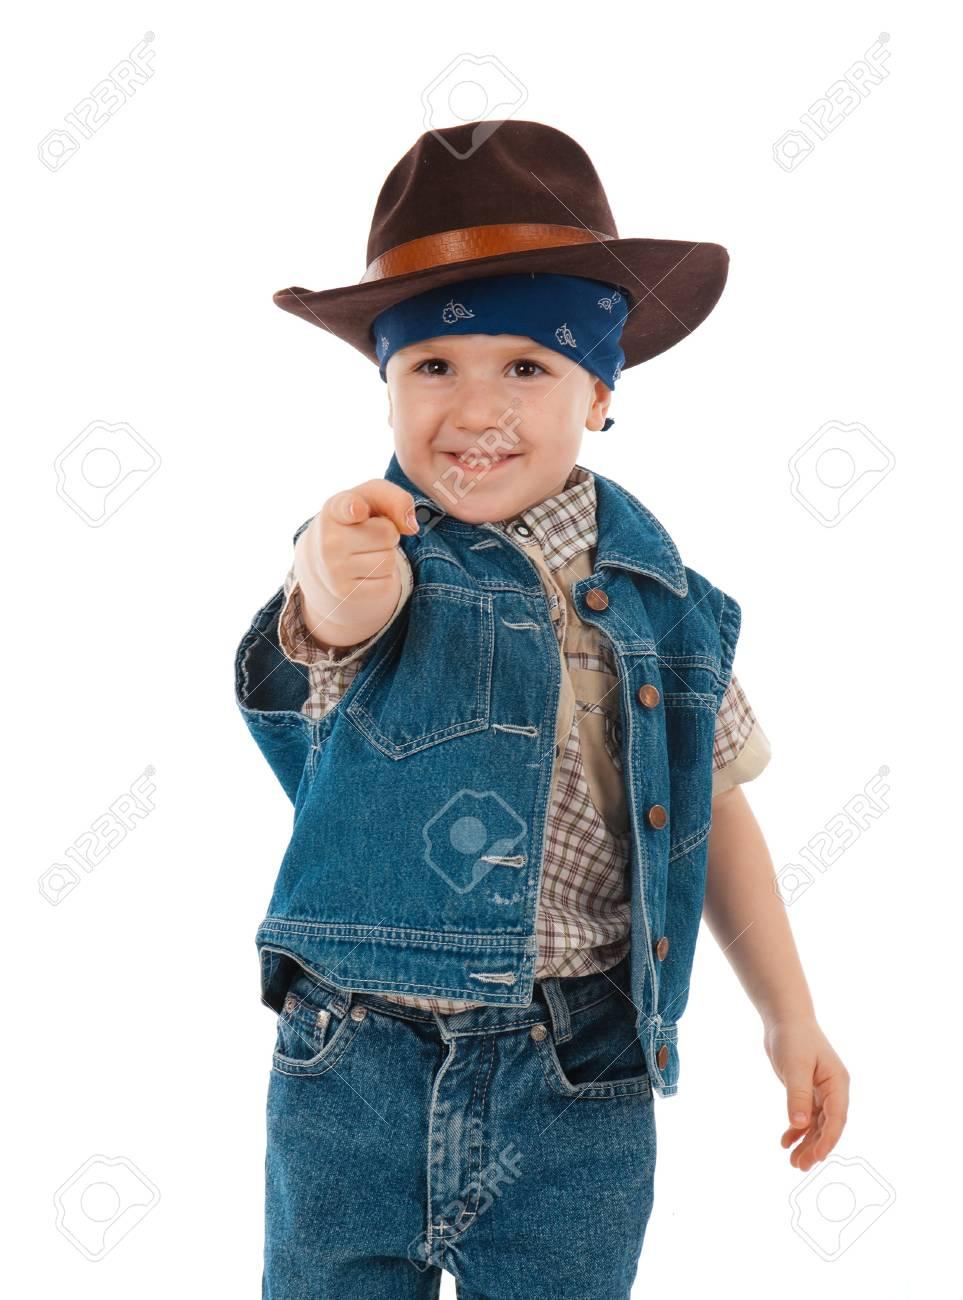 6b7becda5e1c5 little boy wearing a cowboy hat a over white background Stock Photo -  10474324